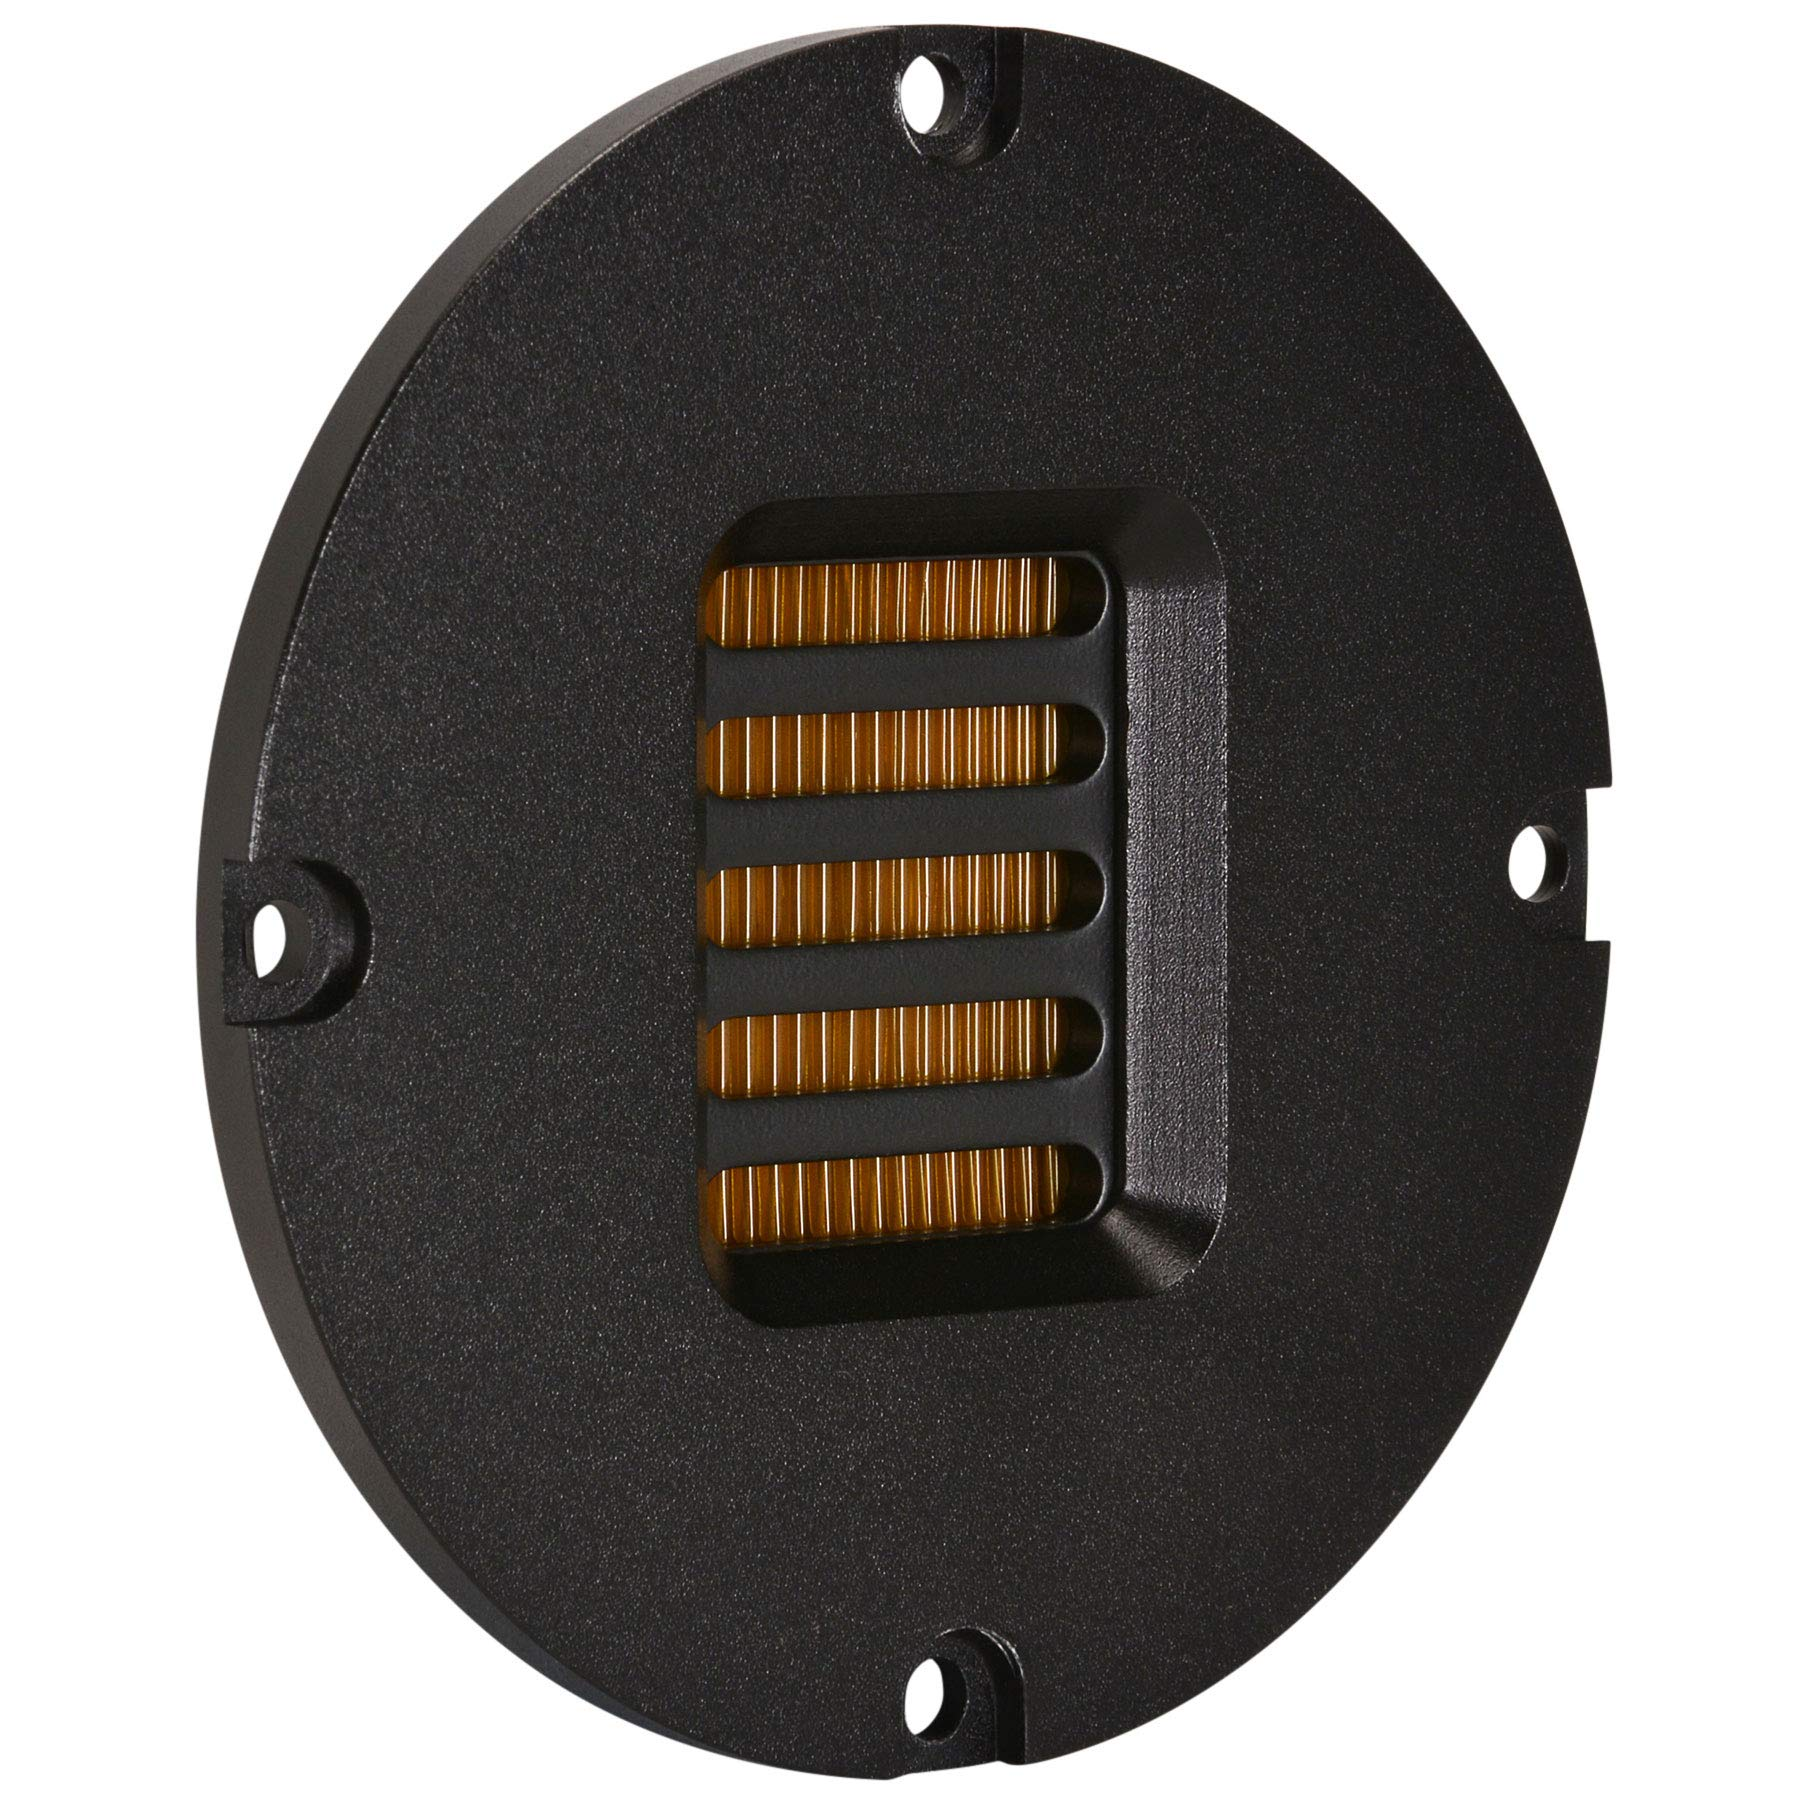 Dayton Audio AMT2-4 Air Motion Transformer Tweeter 4 Ohm